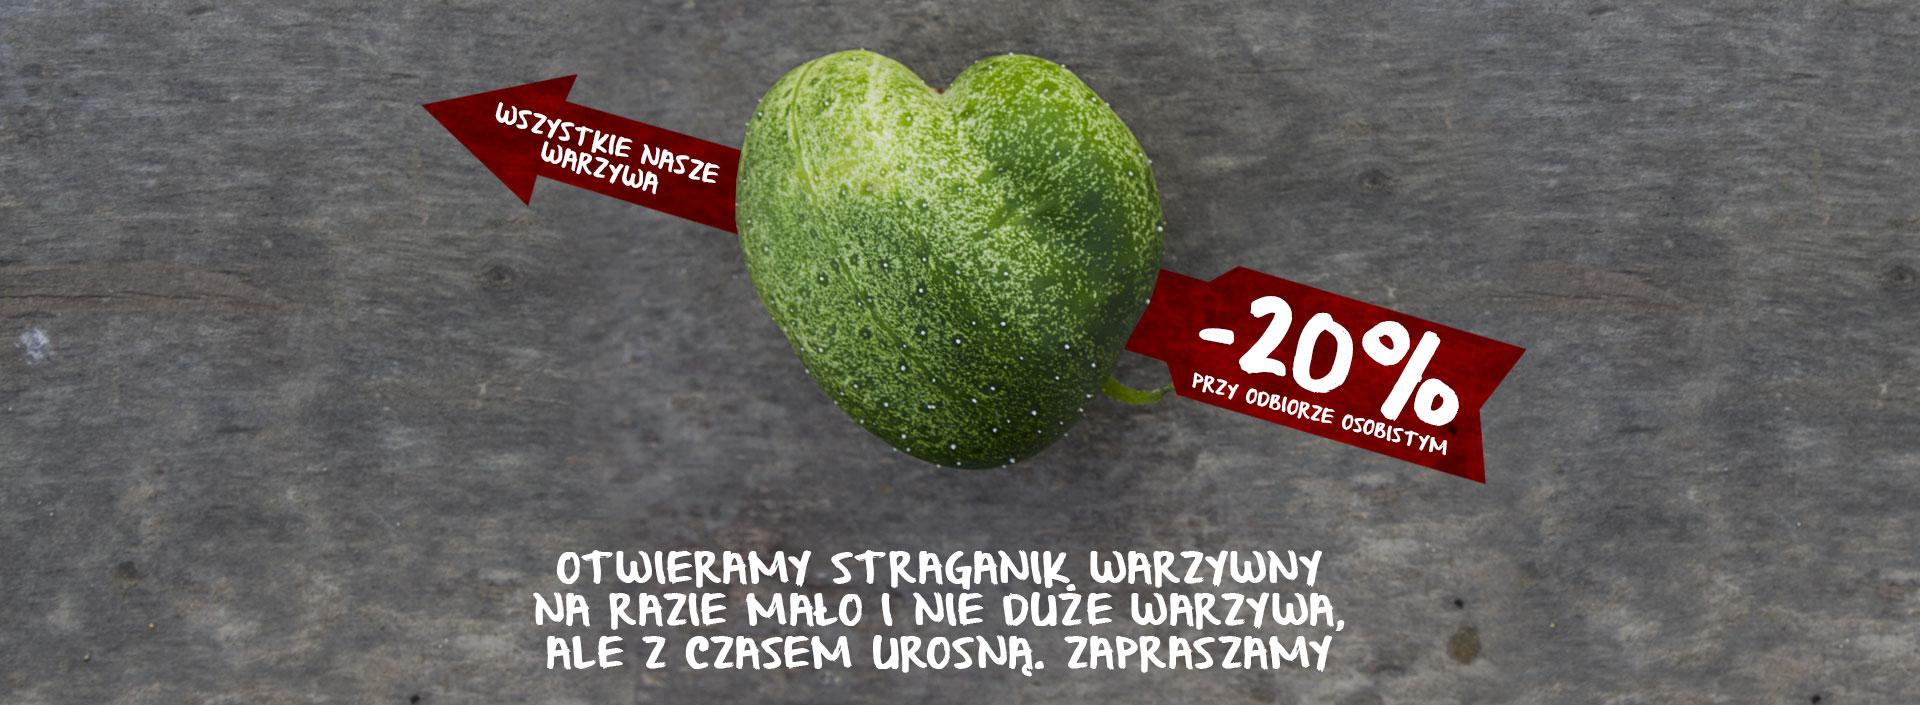 banerOtwieramy-20_